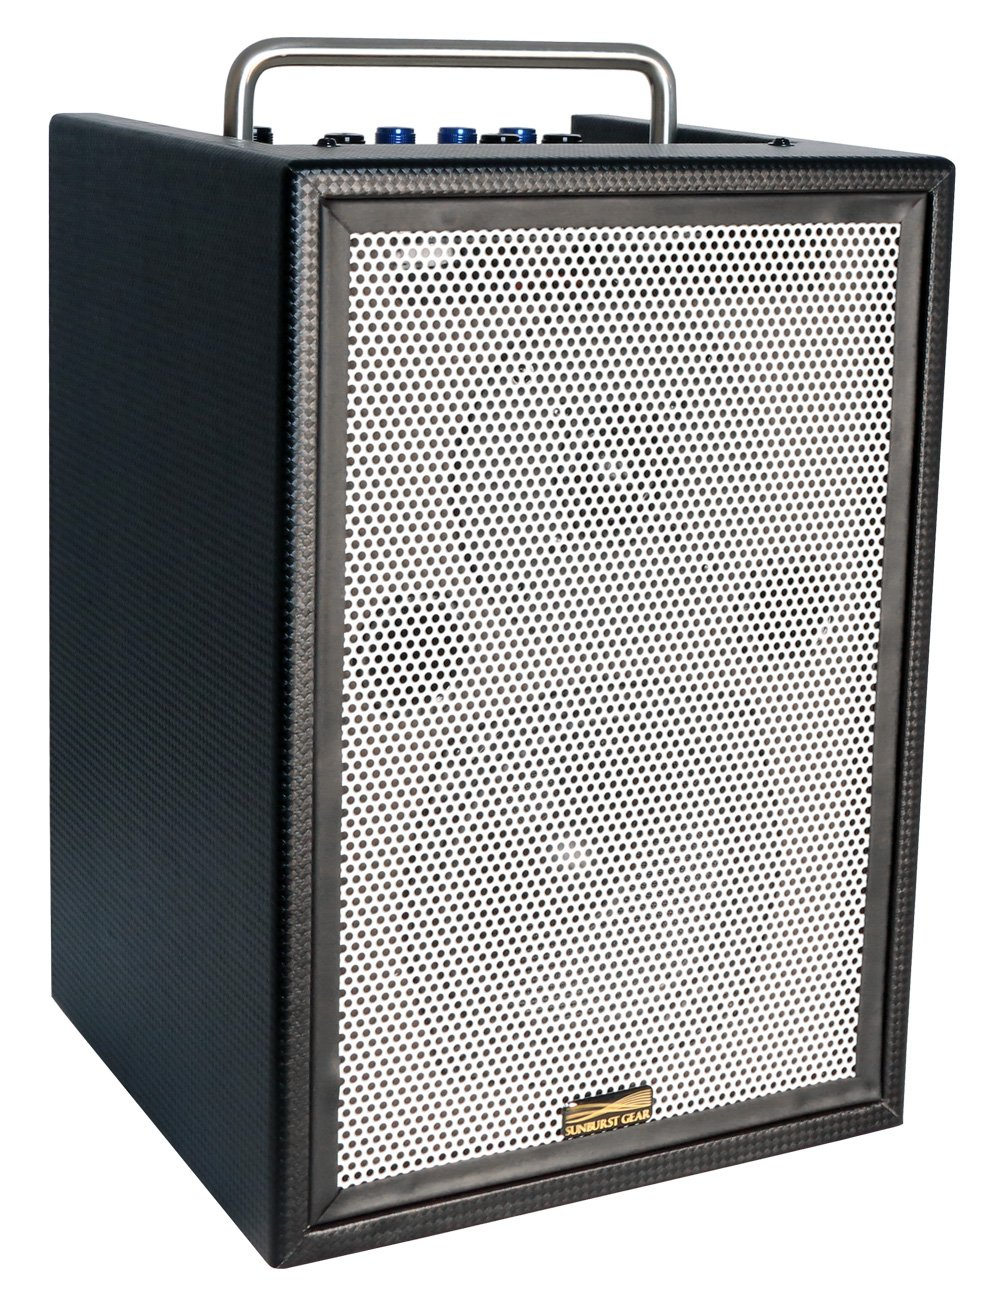 Sunburst Gear M3R8 Portable All-In-One Rechargeable Battery Powered Monitor/Mini-PA Speaker by Sunburst Gear